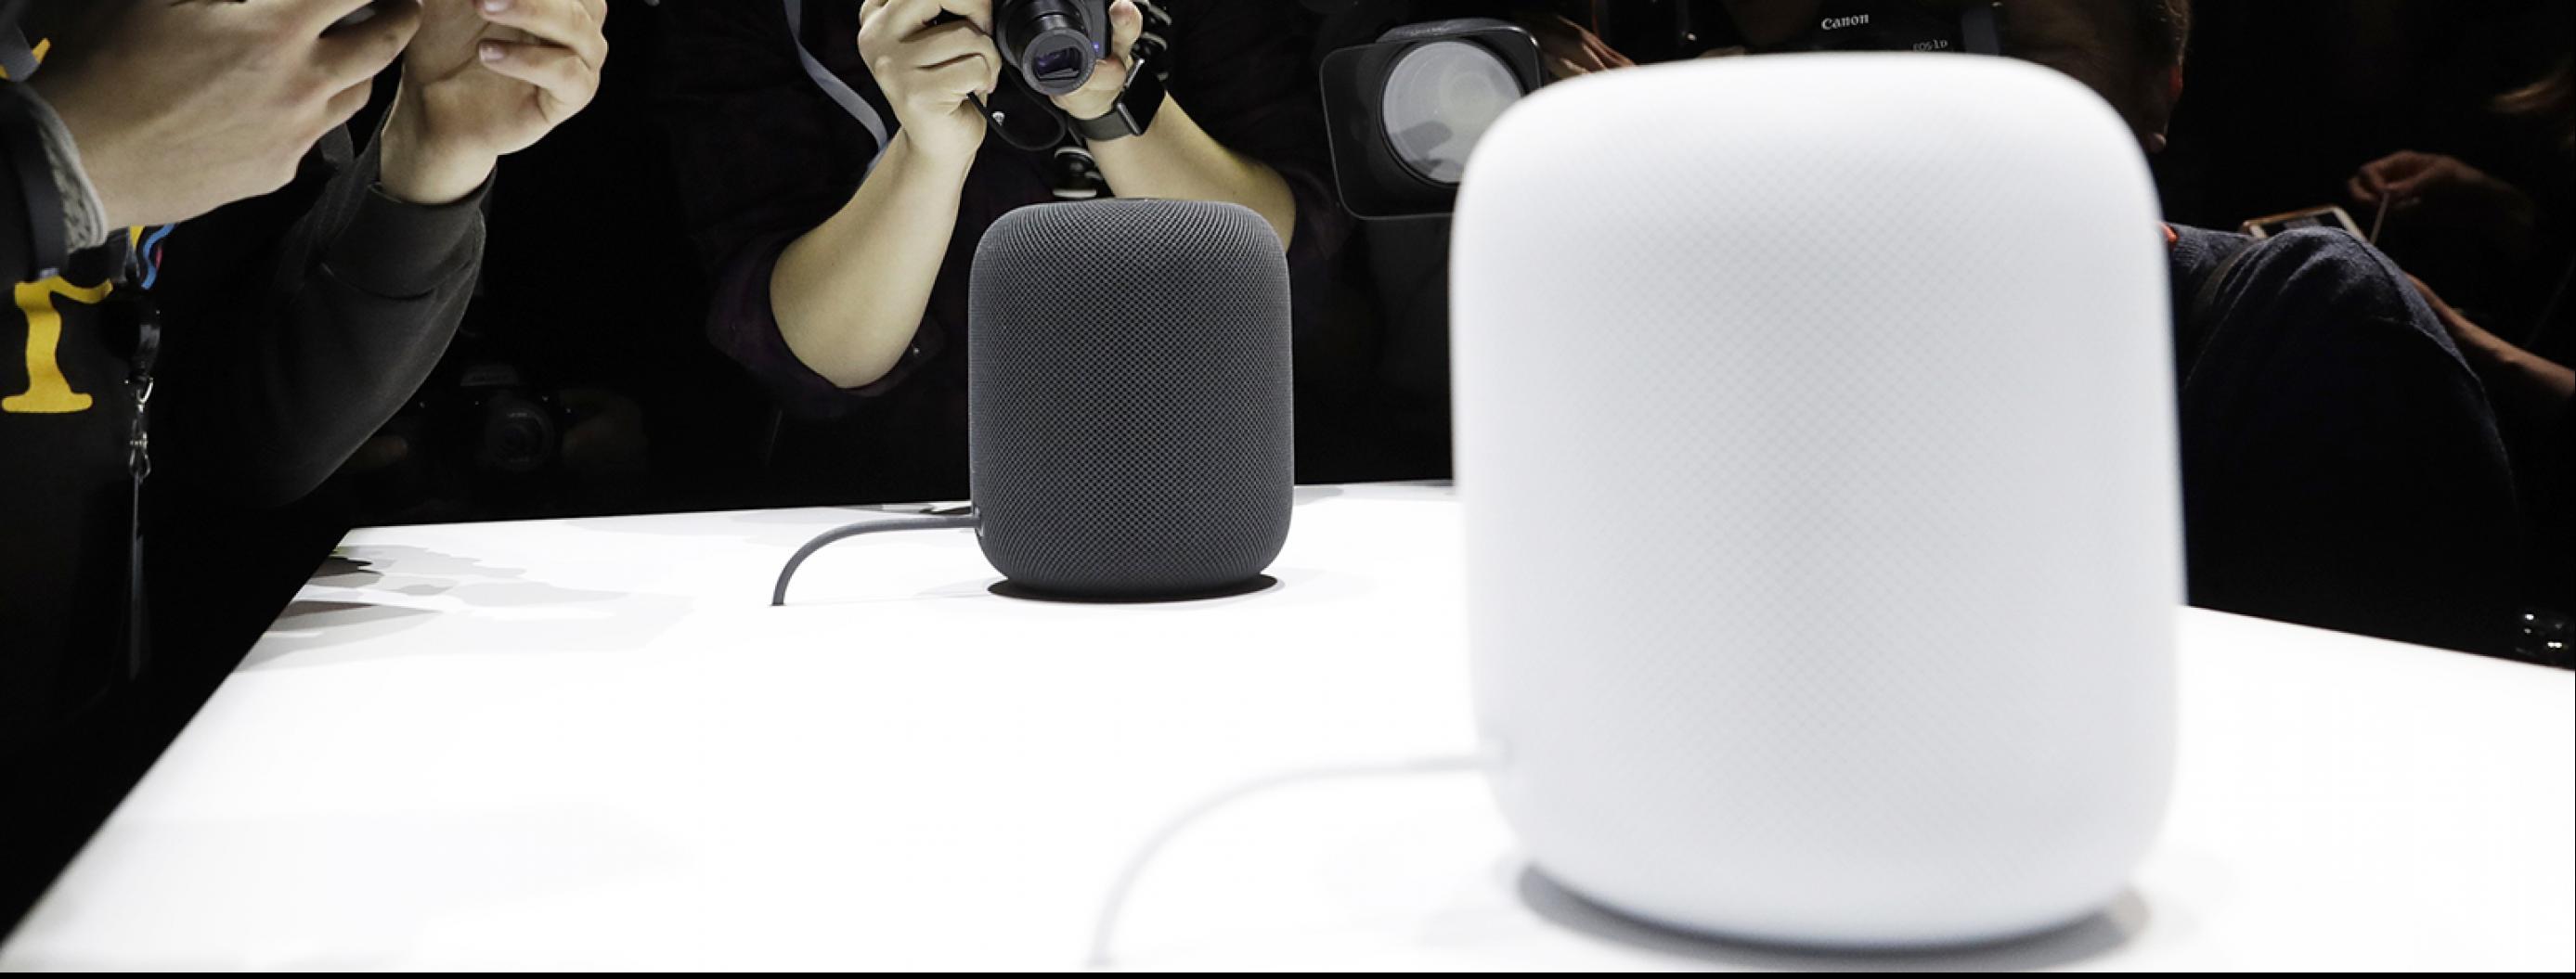 Apple's New and Innovative HomePod Will Rival Amazon's Echo